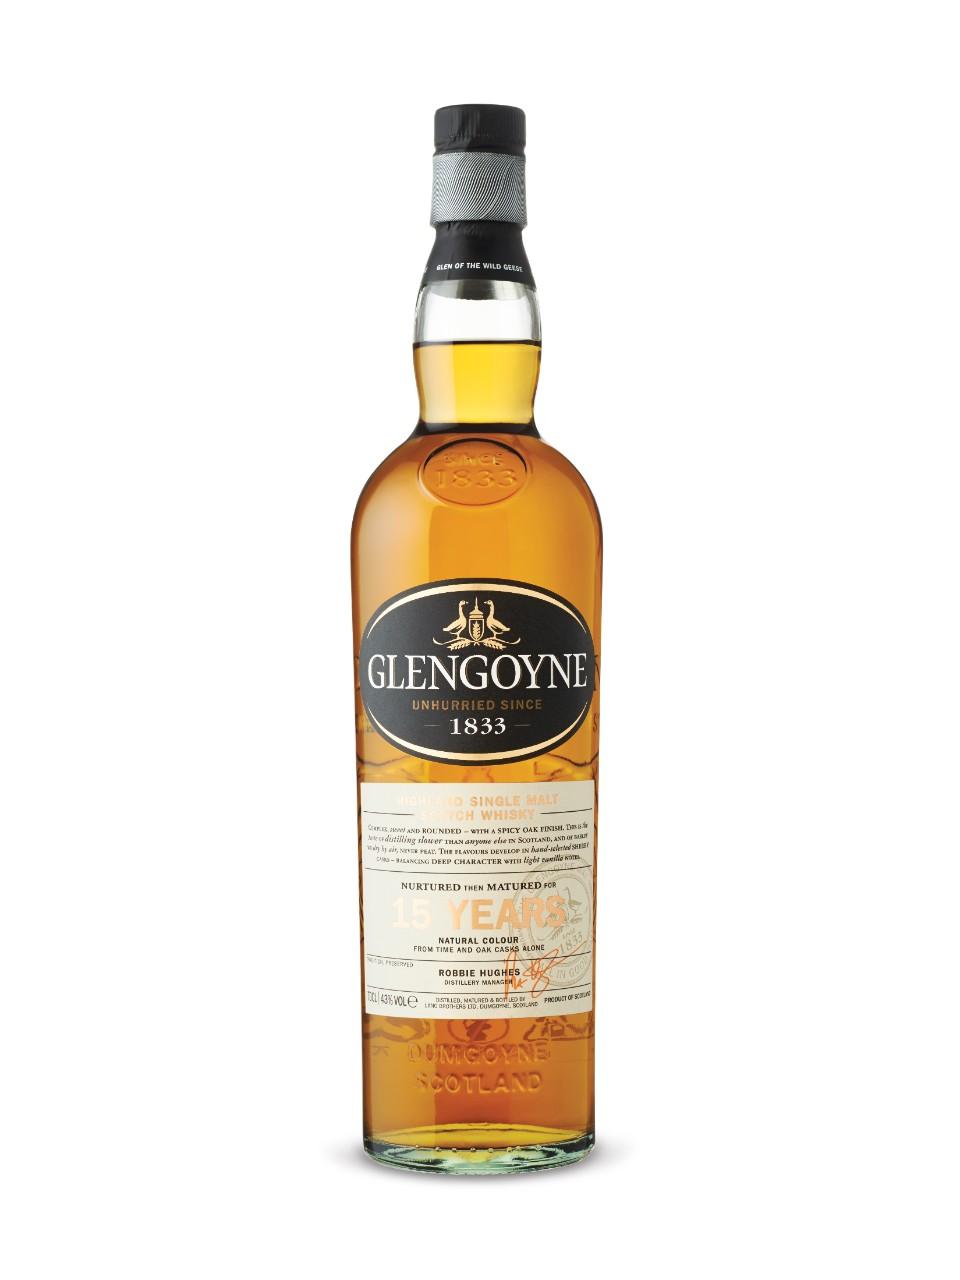 Glengoyne 15 Year Old Highland Single Malt